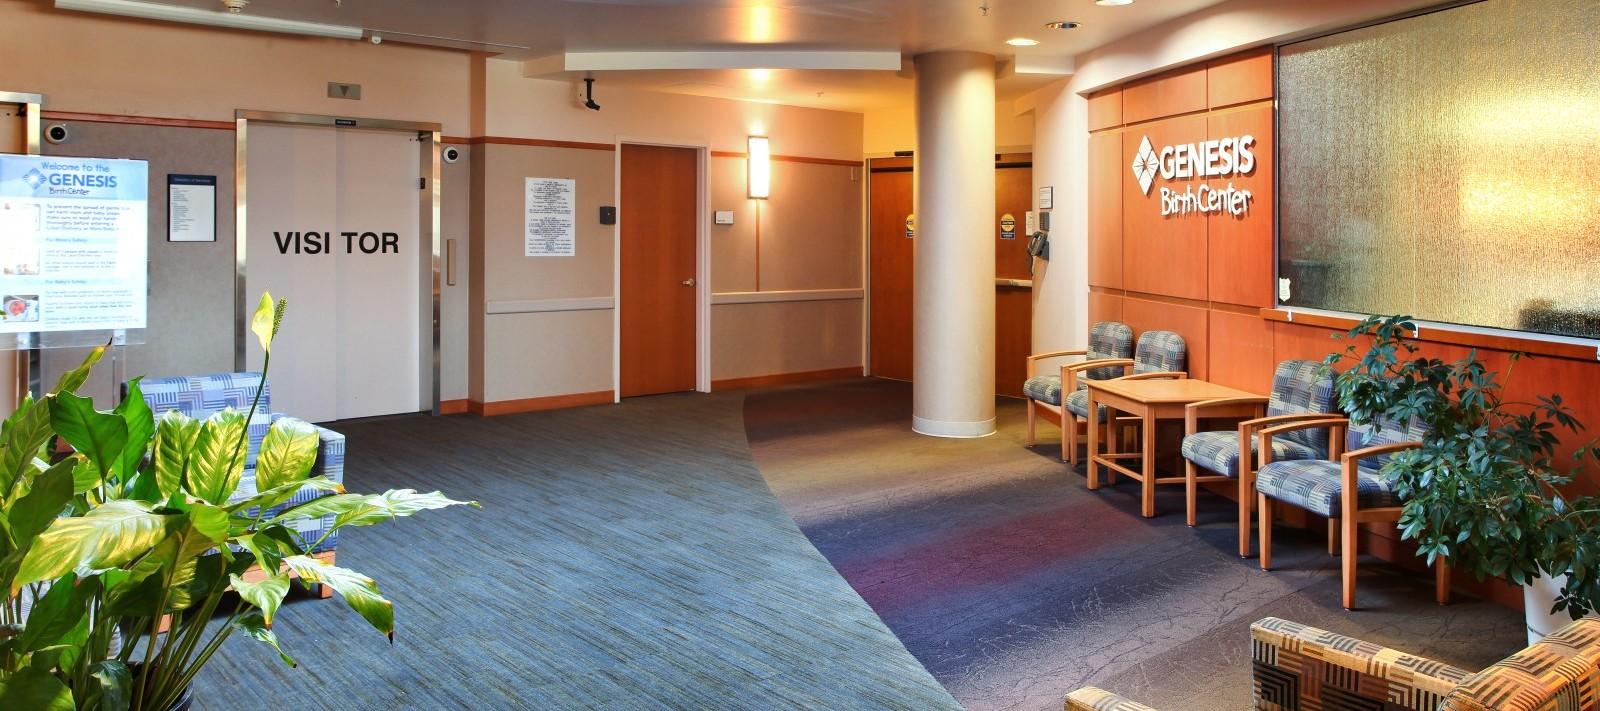 Genesis Birth Center foyer